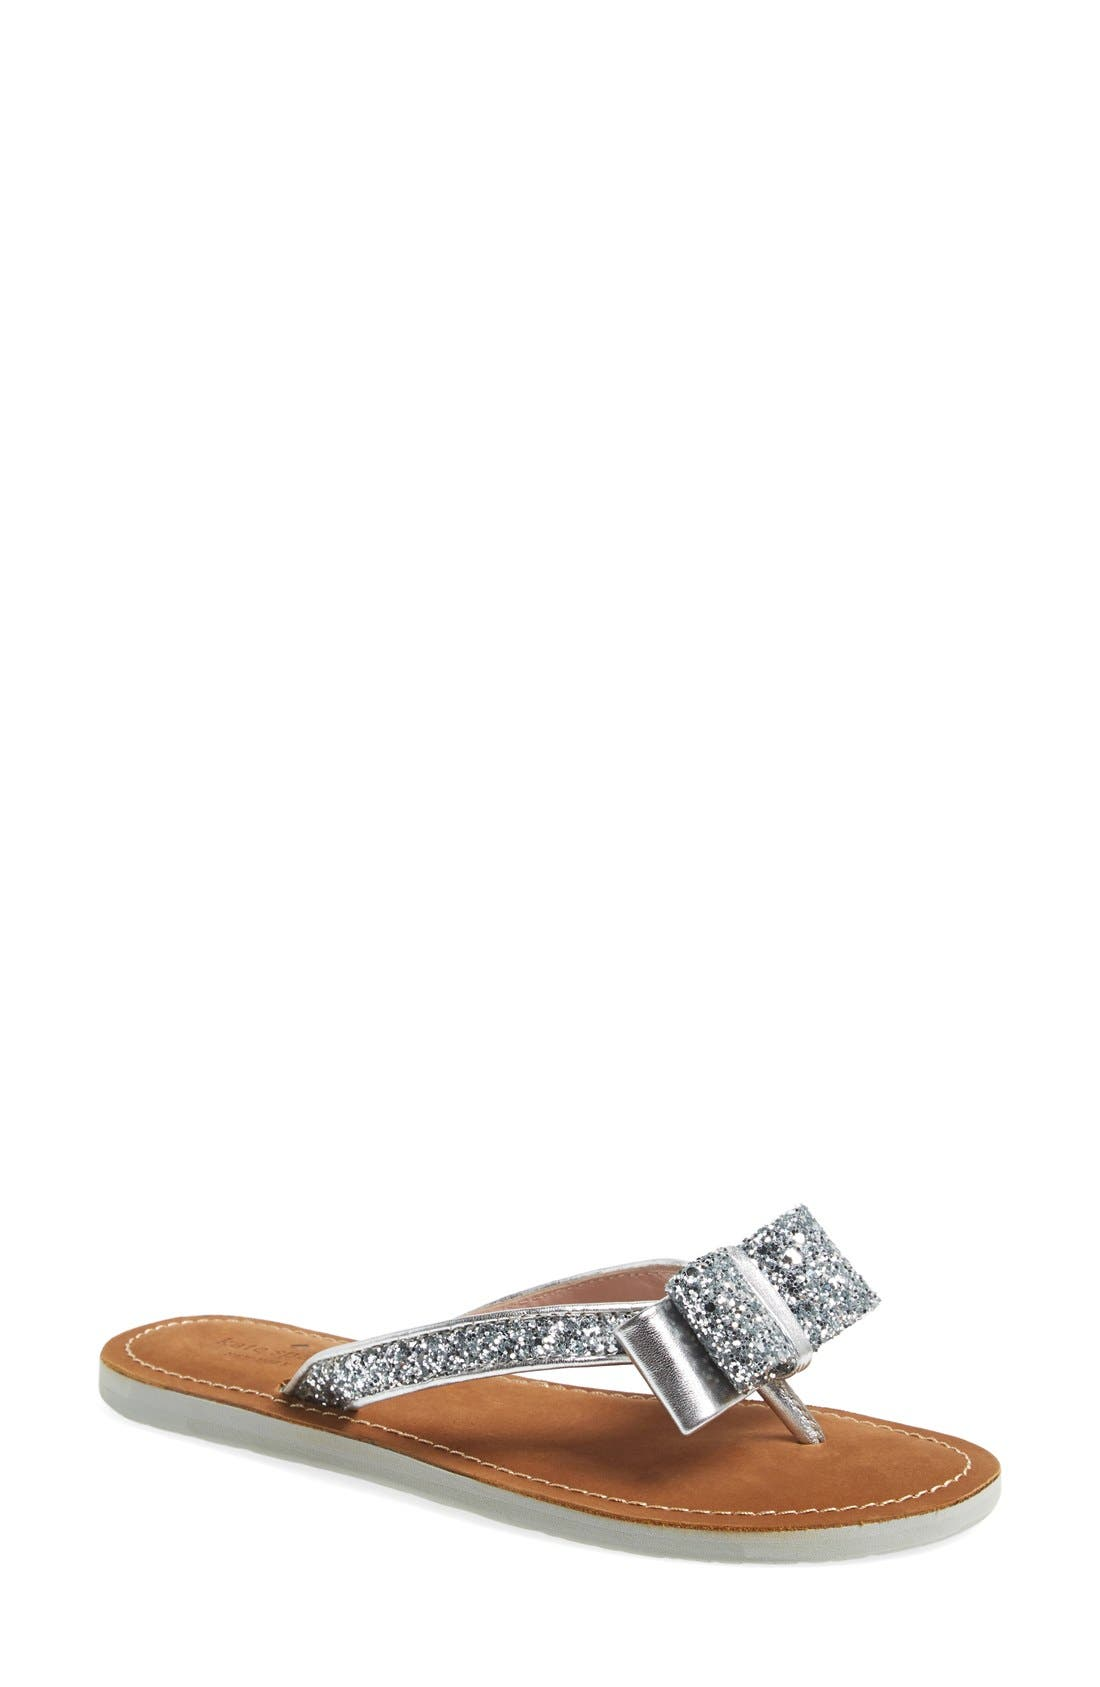 'icarda' glitter flip flop,                         Main,                         color, SILVER